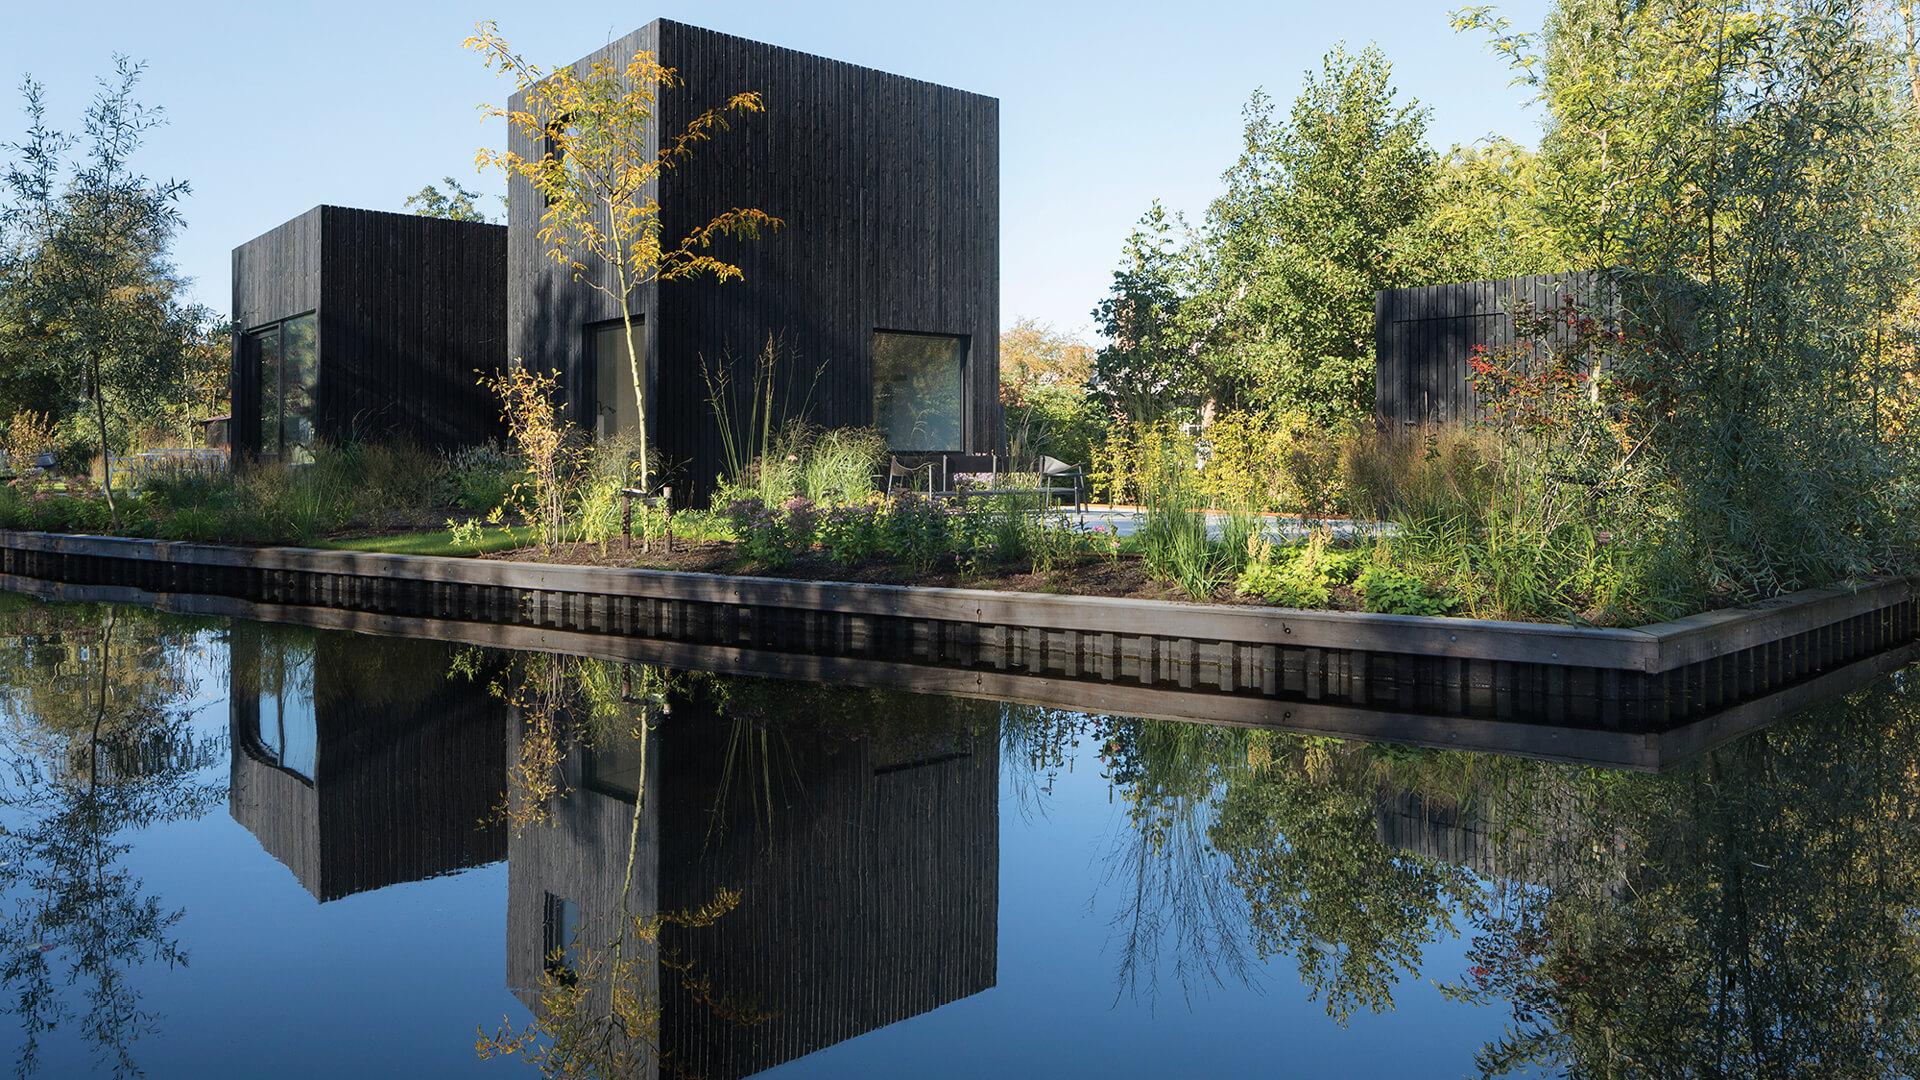 Tiny Holiday Home by i29 Architects | i29 Architects | STIRworld